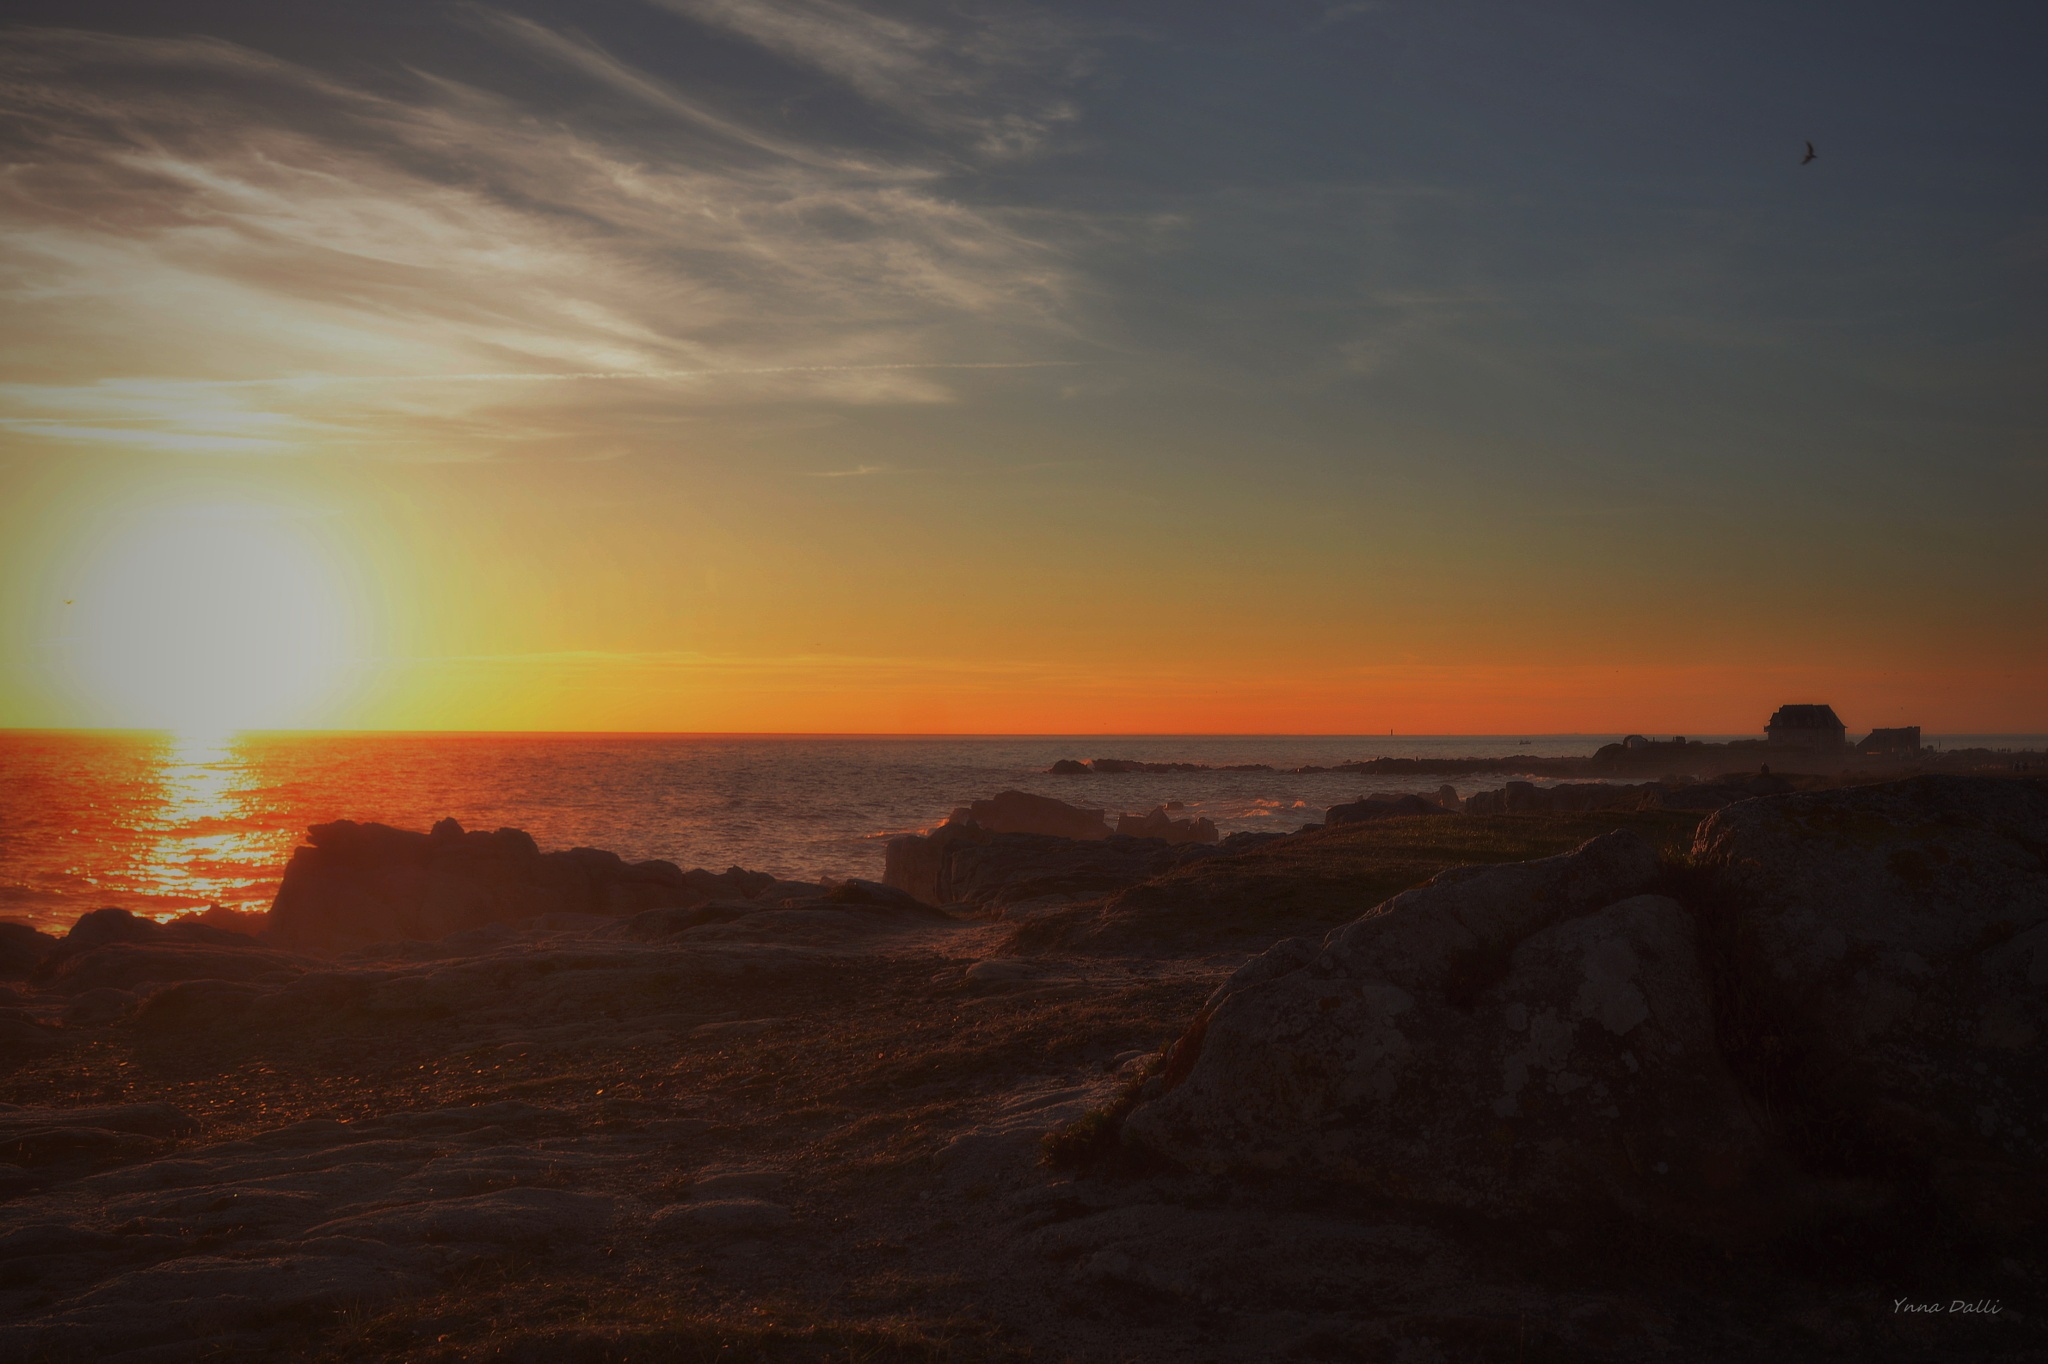 Coucher de soleil dans le brouillard ...    ocean atlantique by YnnaDalli